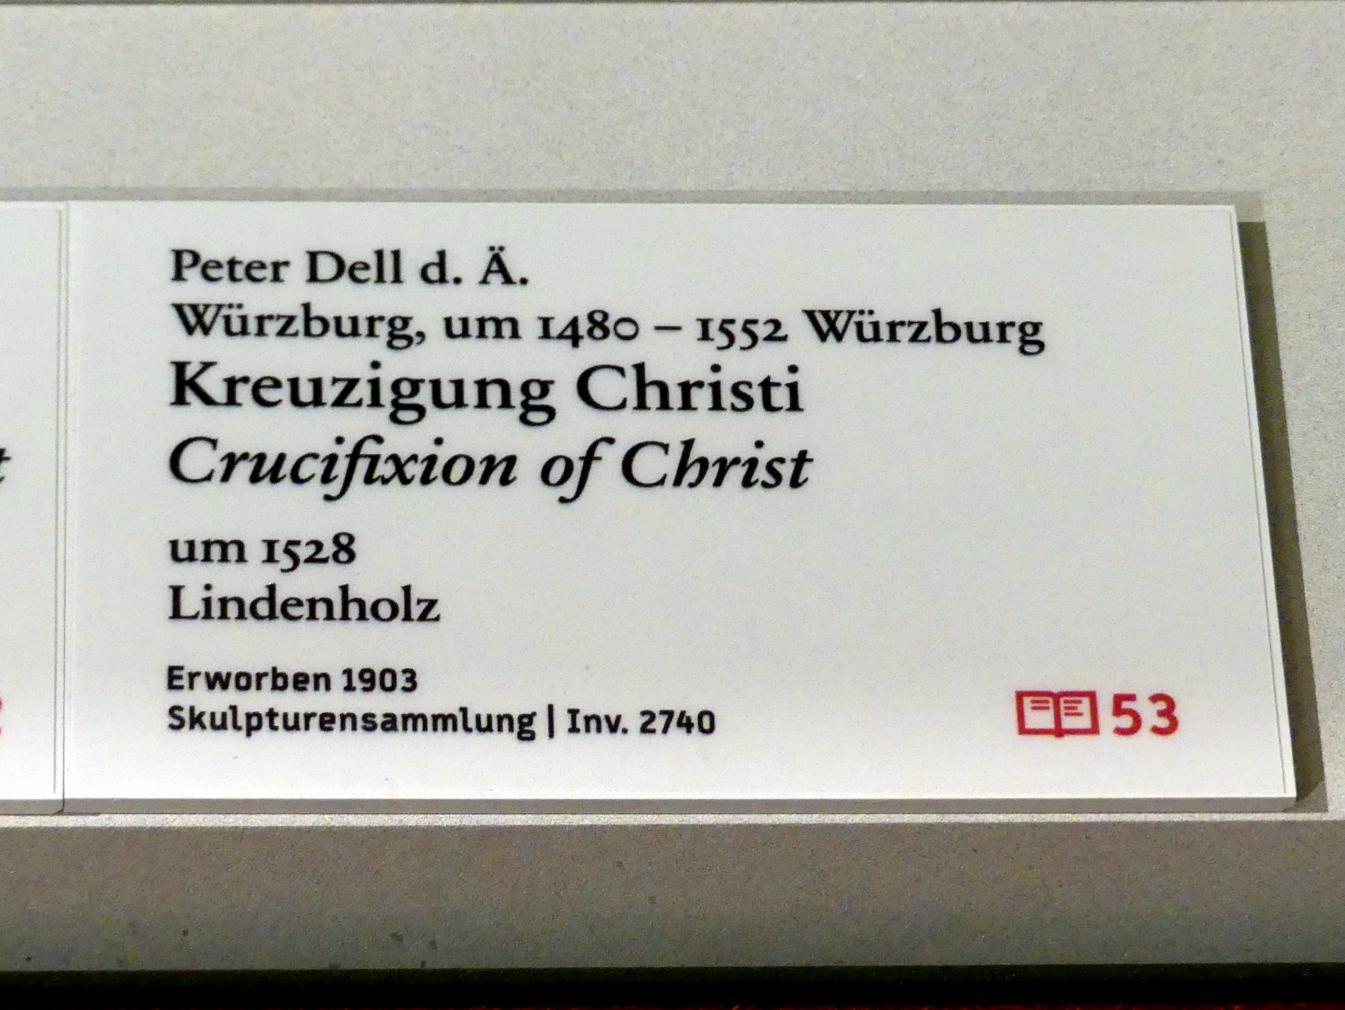 Peter Dell der Ältere: Kreuzigung Christi, um 1528, Bild 2/2